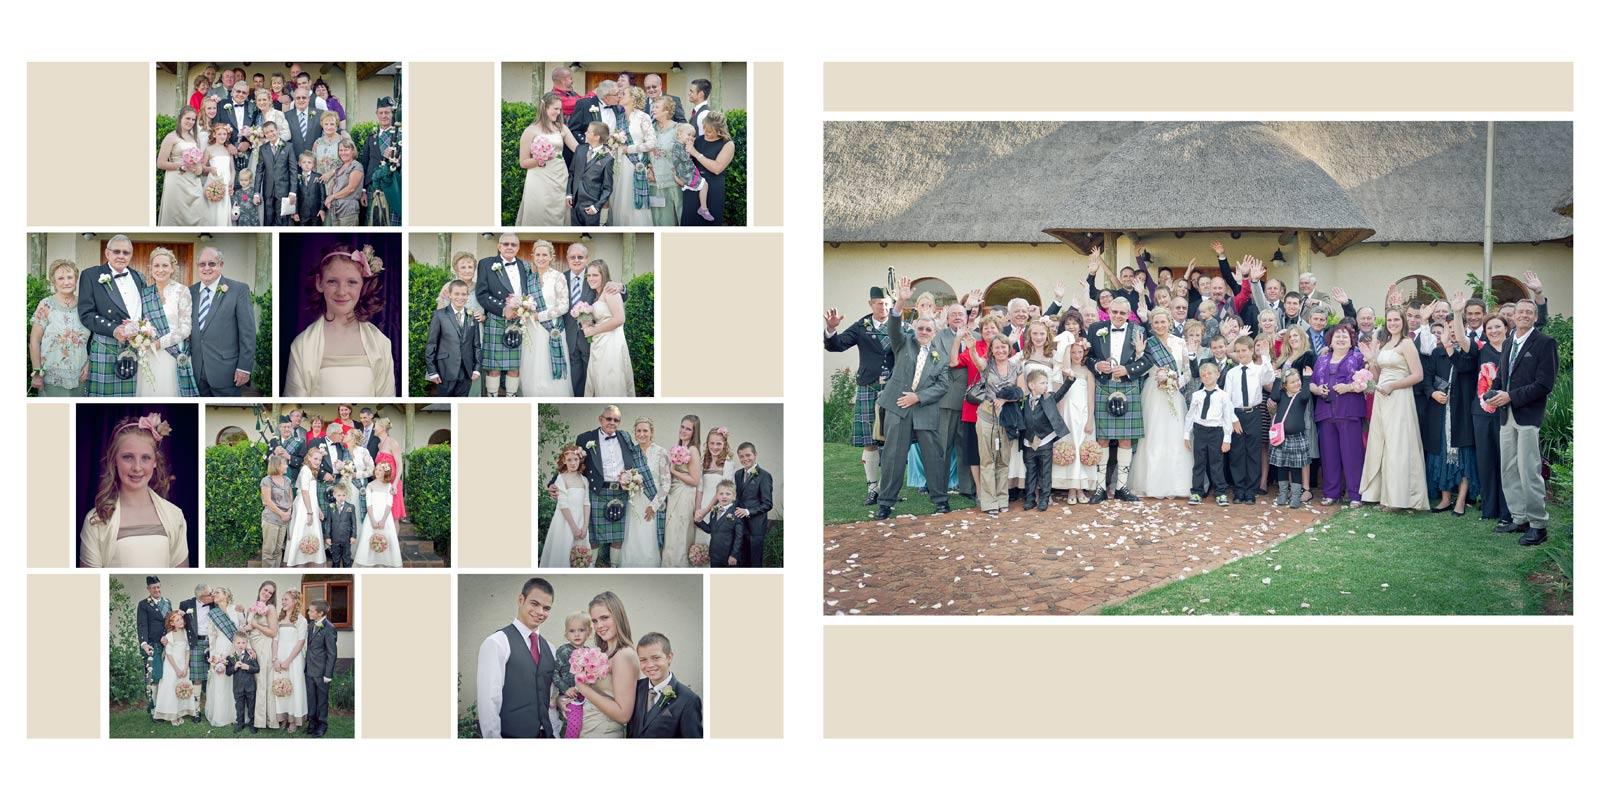 Nathalie Boucry Photography | Deidre and Lister Wedding Album 015